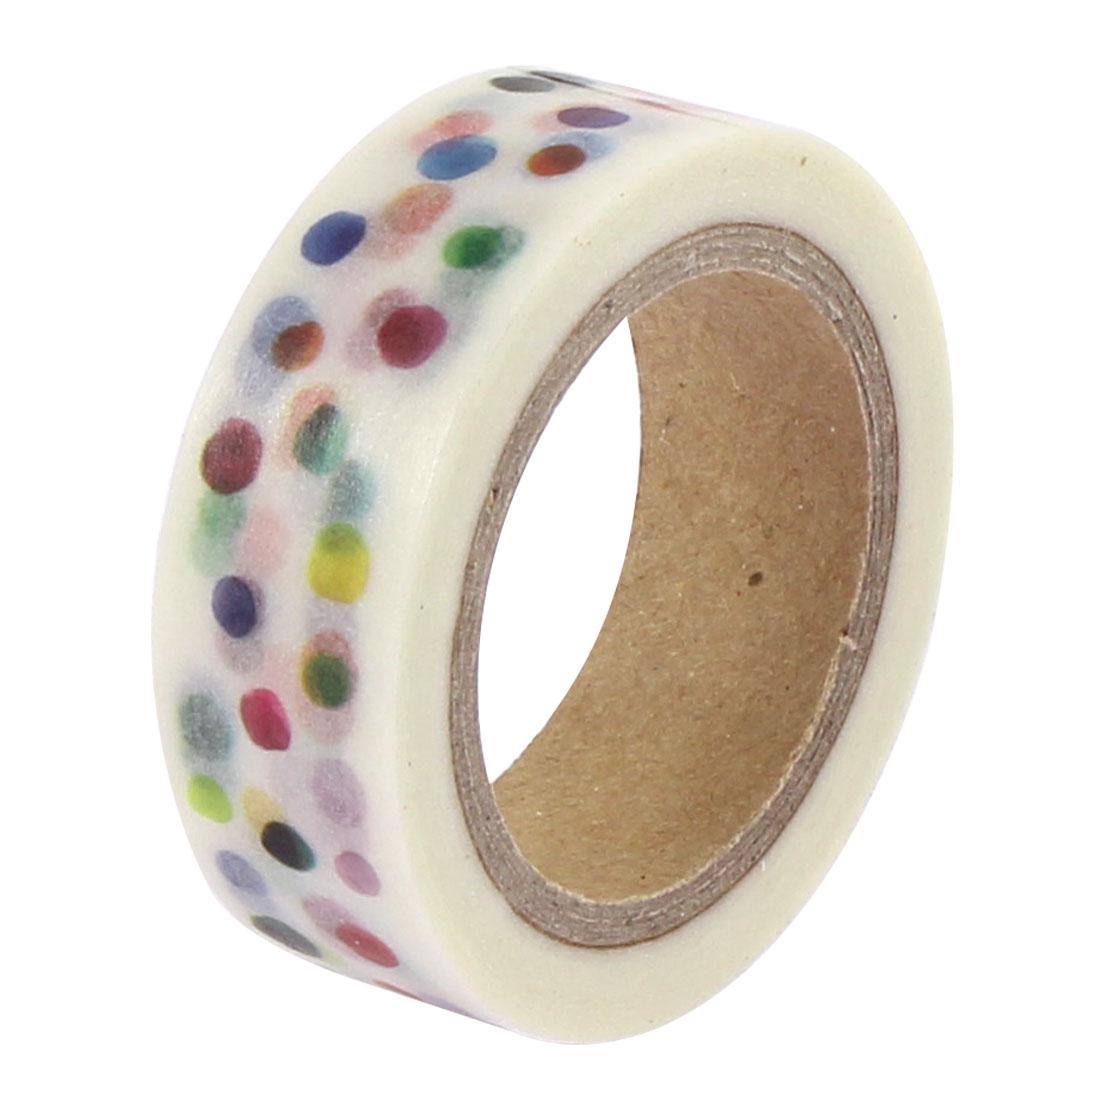 Polka Dot Pattern Sticky Paper Self Adhesive Decorative Tape Sellotape